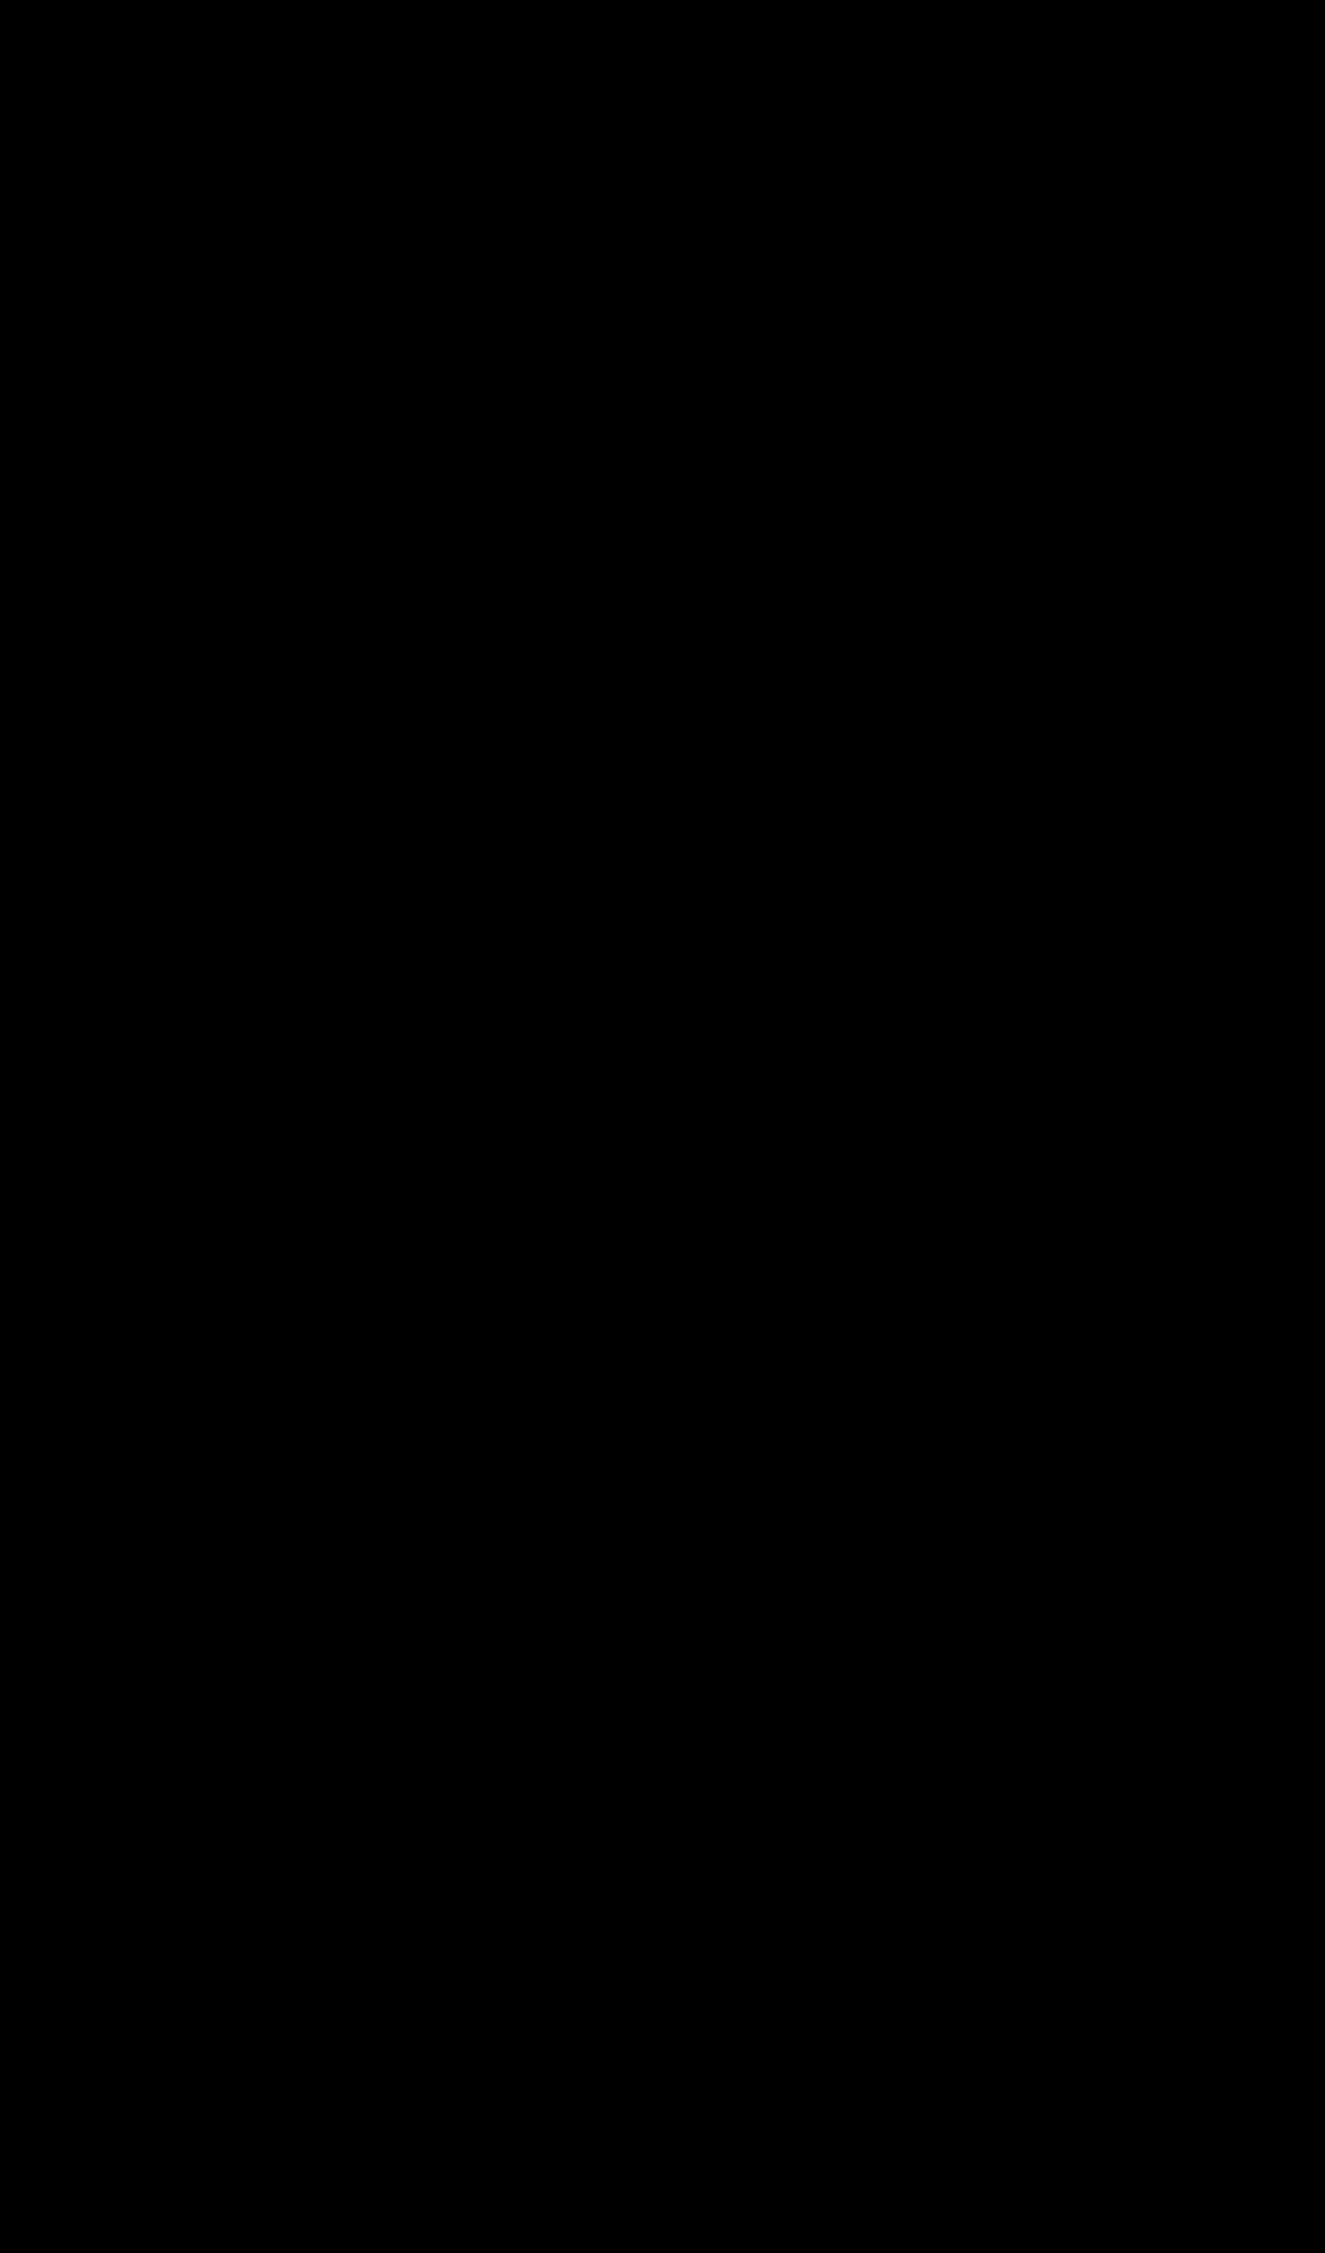 Clipart - letra M de mariposa